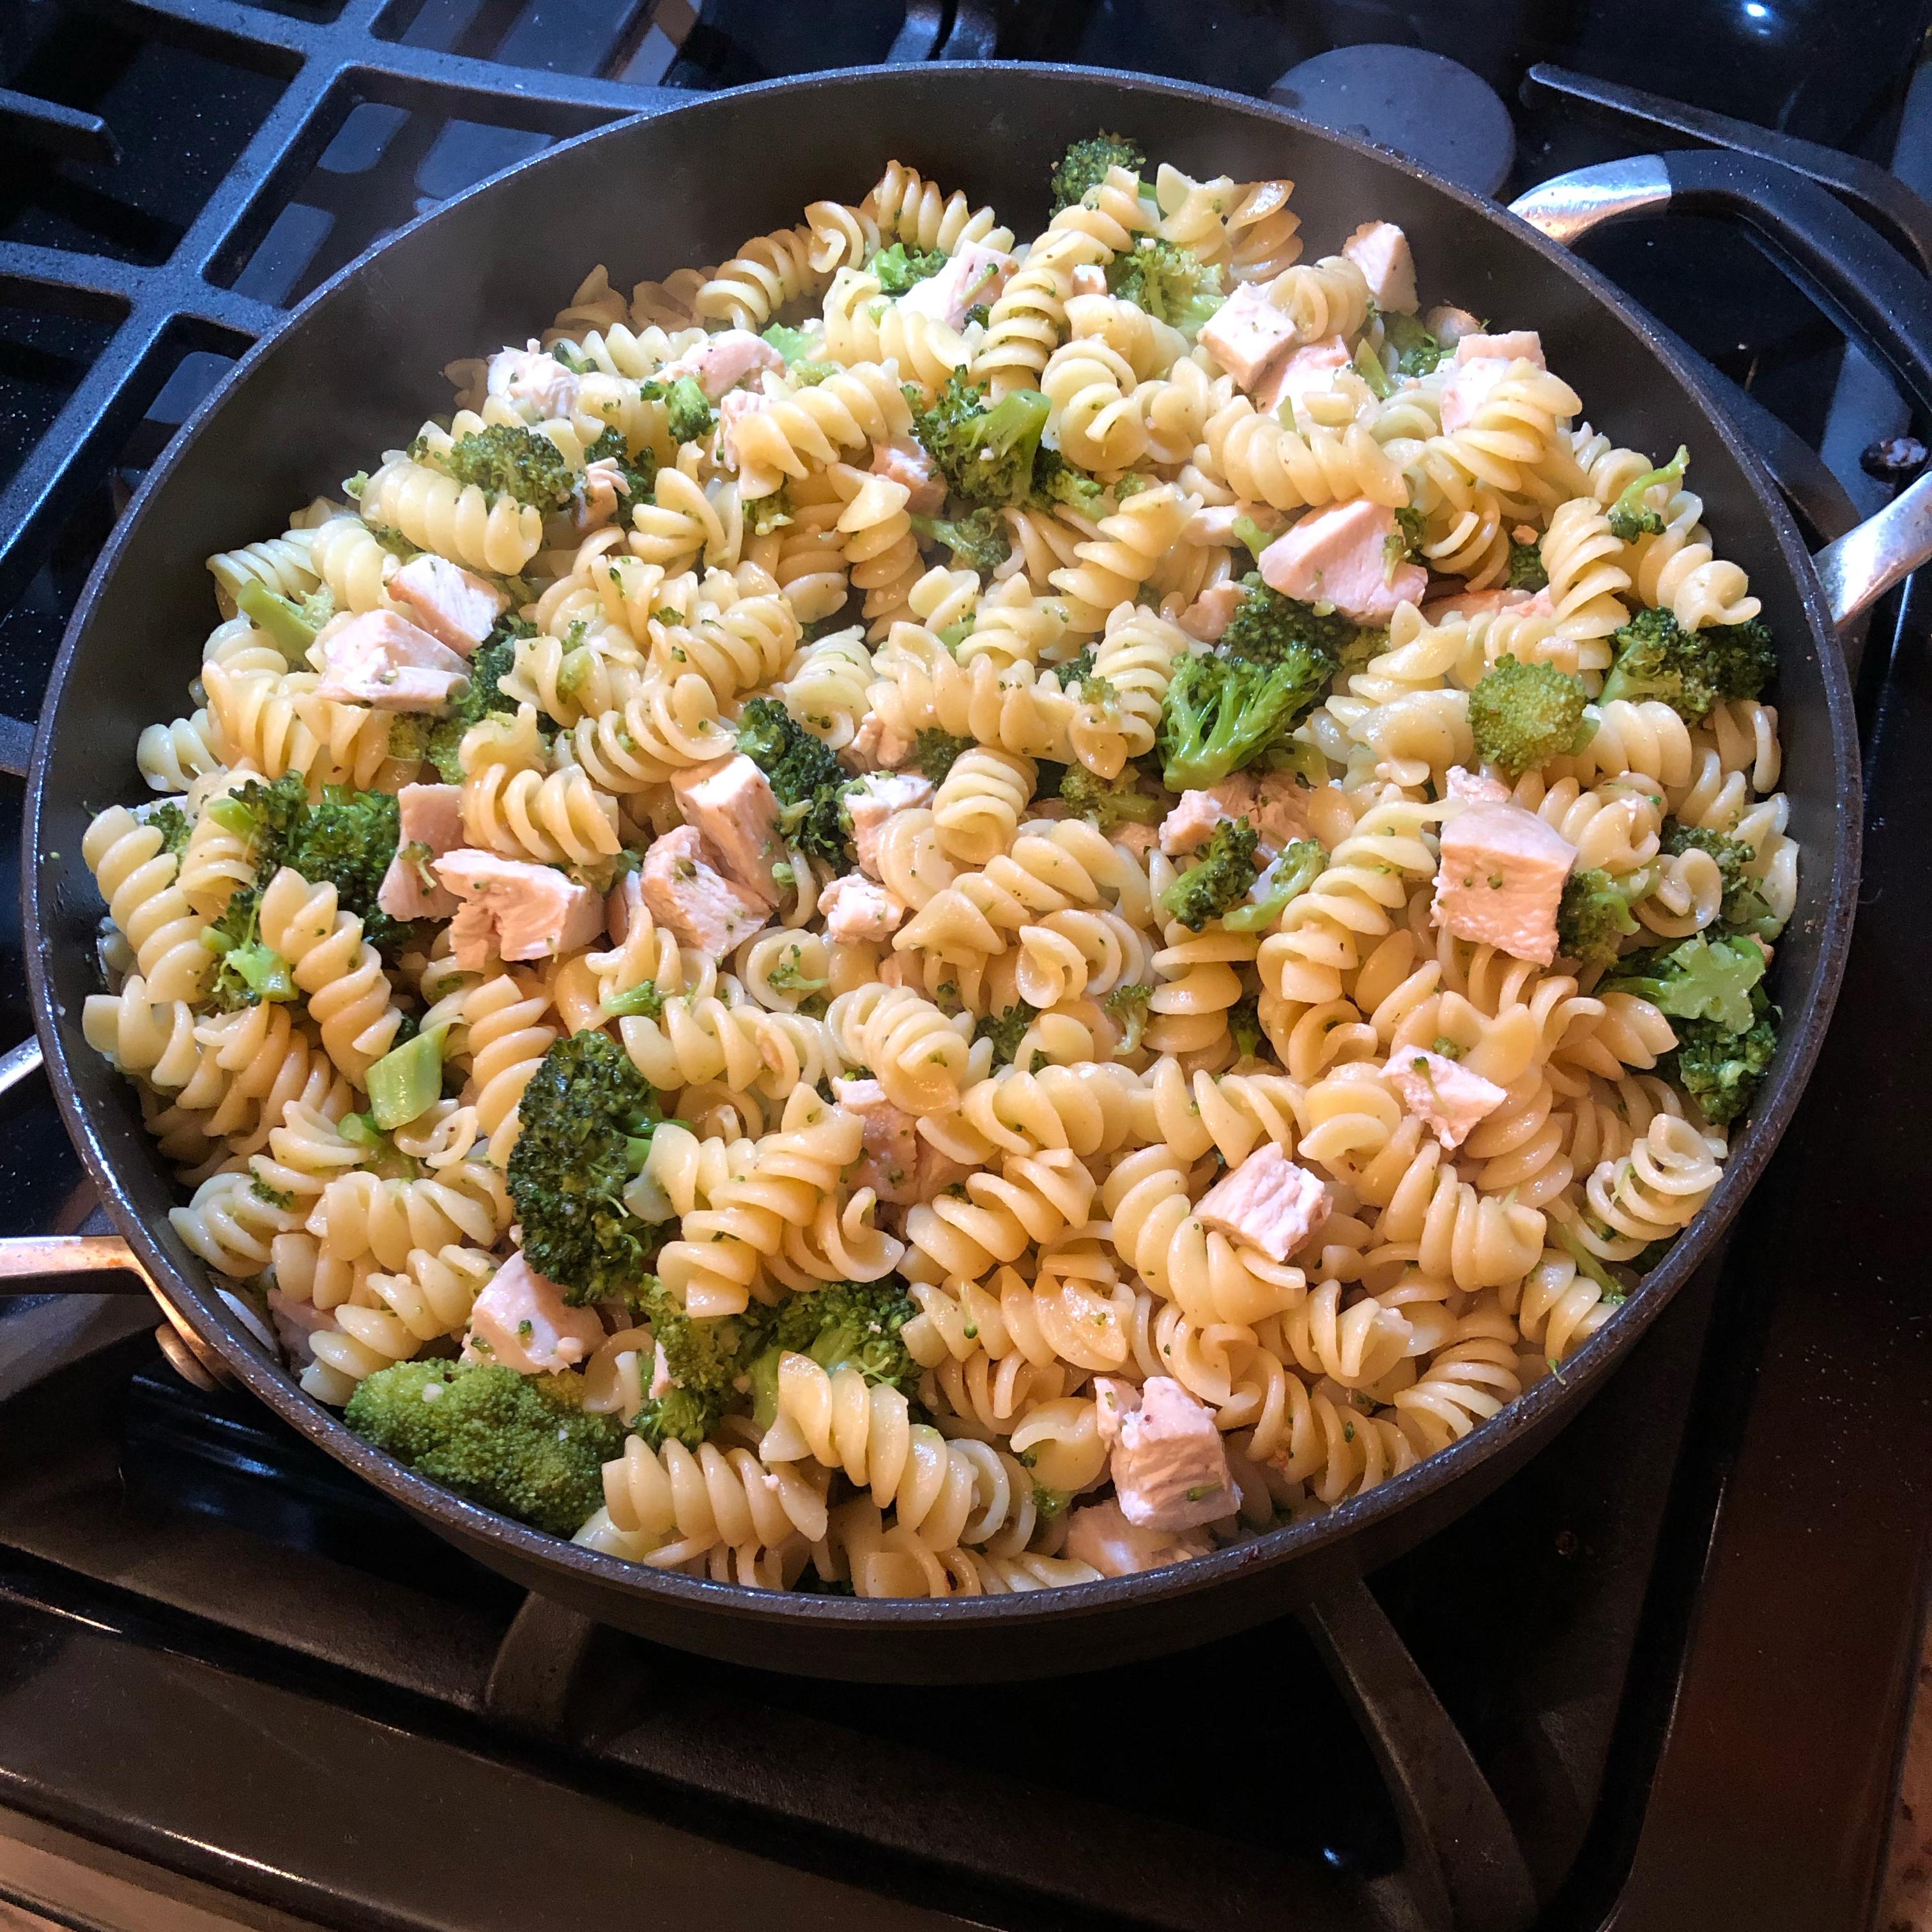 Cavatelli and Broccoli